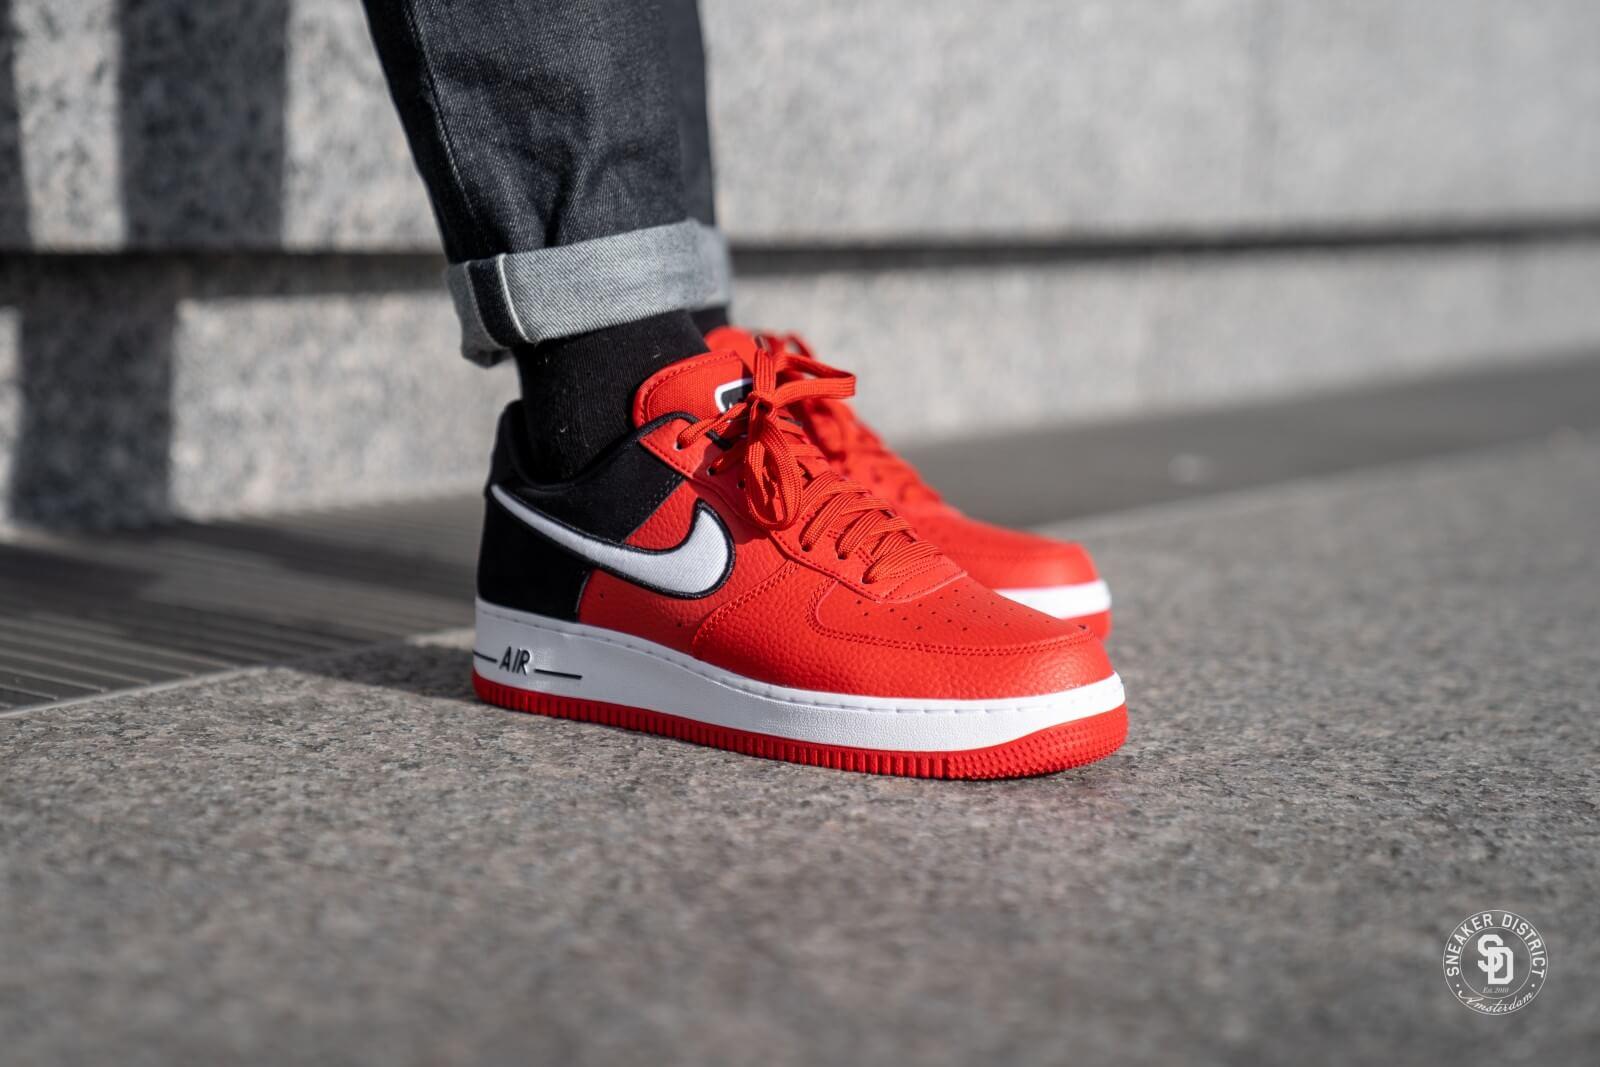 Nike Air Force 1 '07 LV8 1 Mystic Red